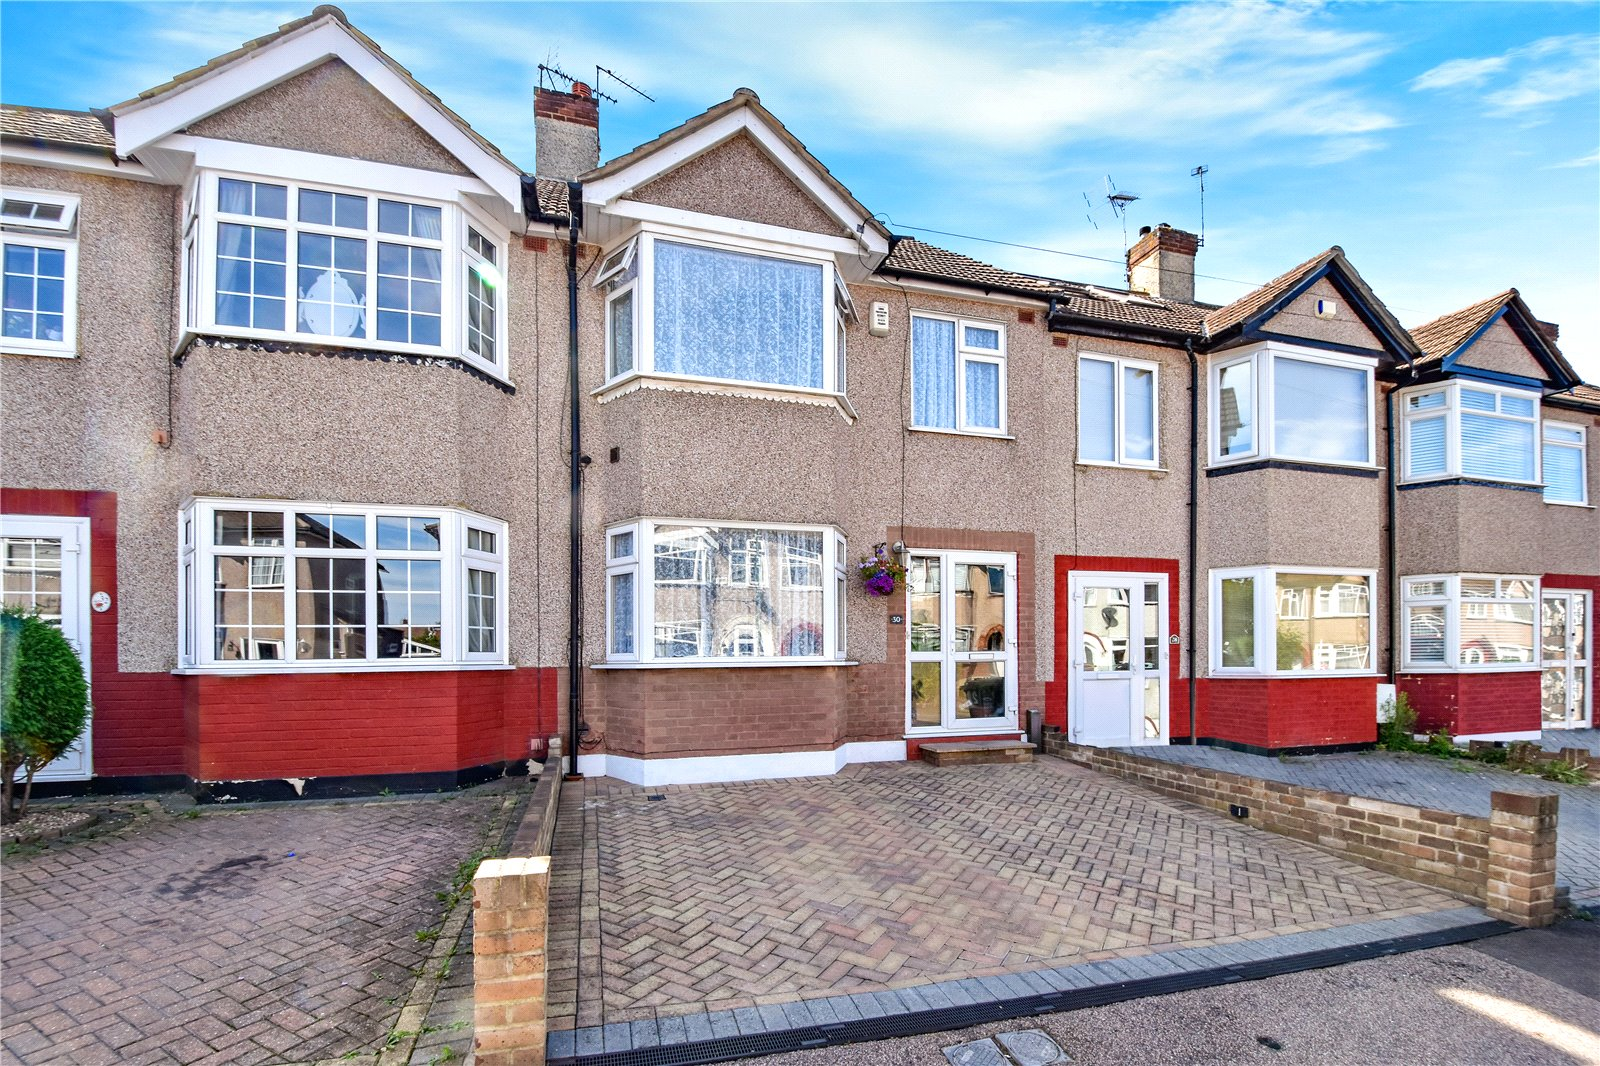 Dorchester Close, Dartford, DA1